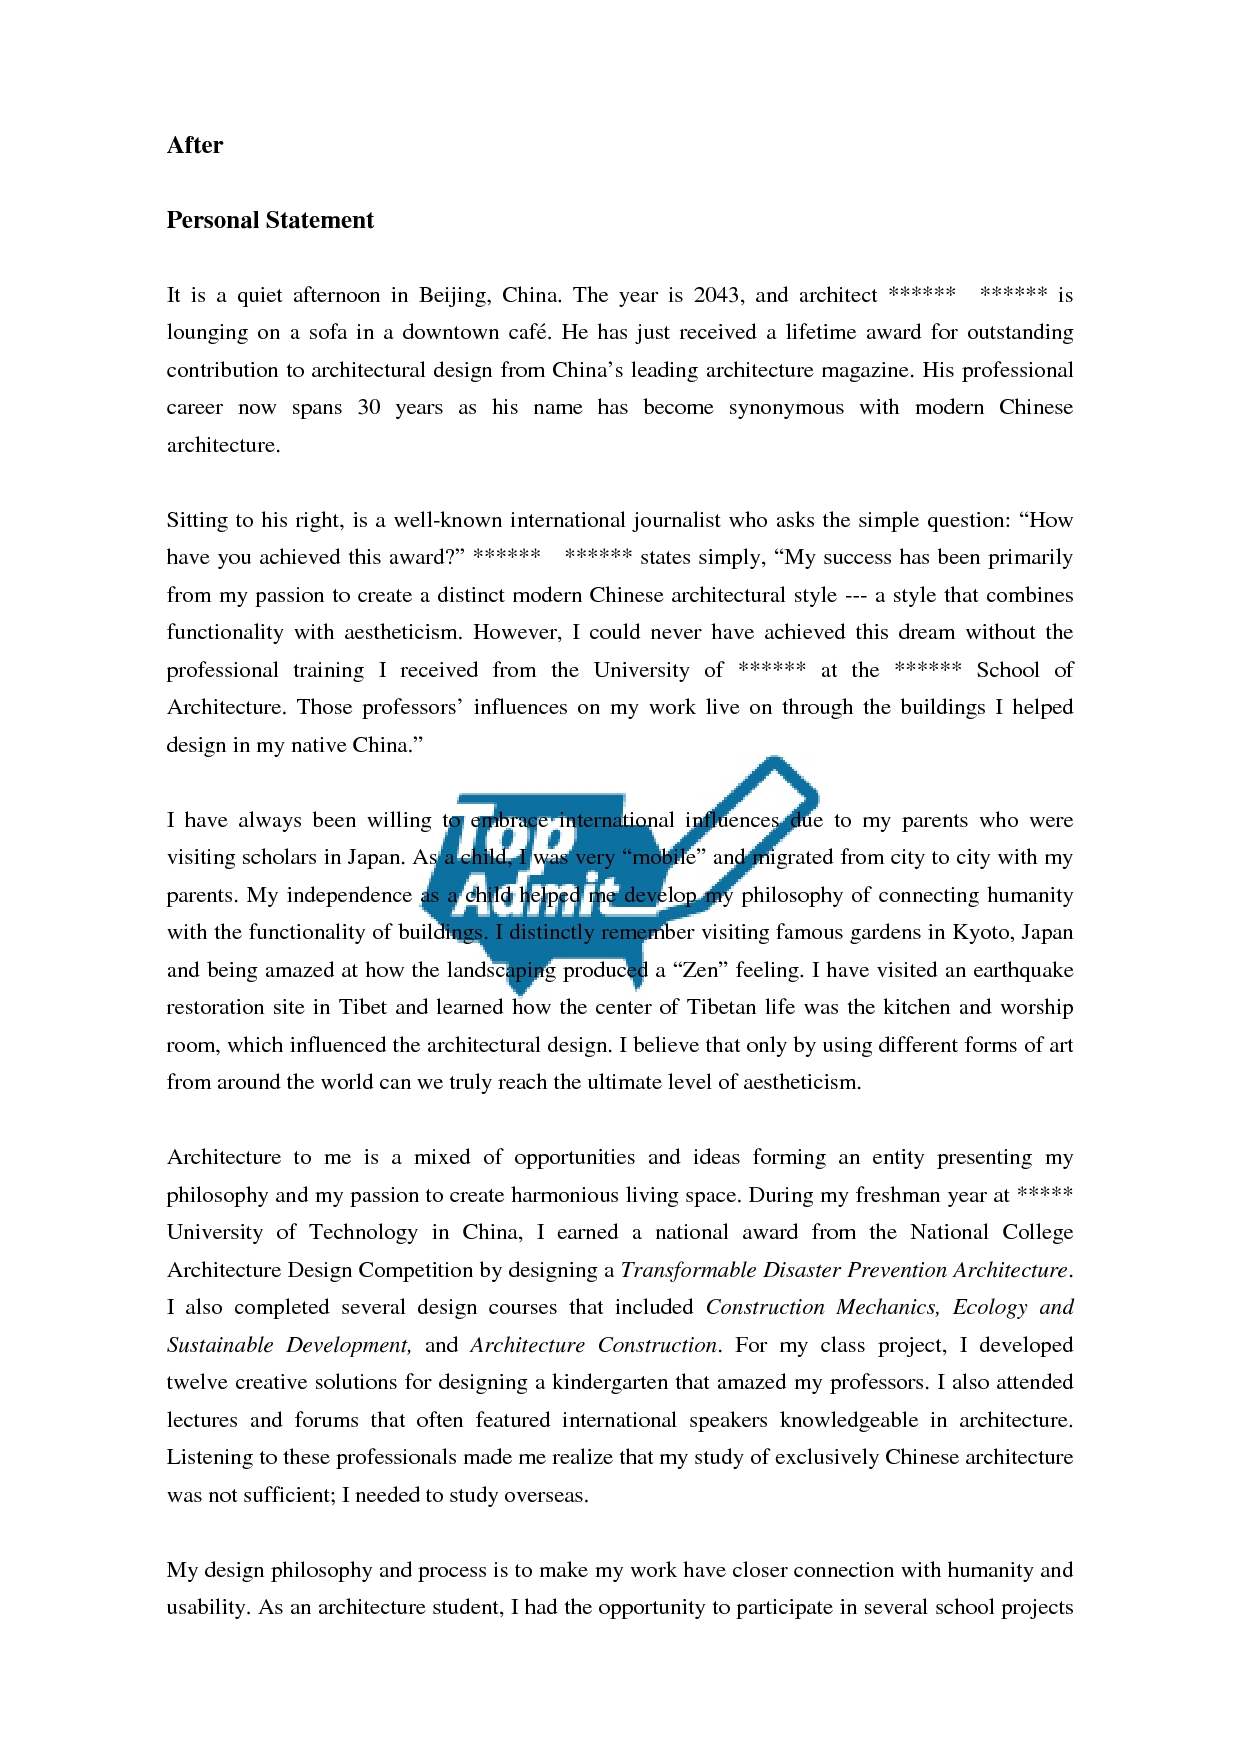 026 Zwjgmmd Common App Examples Best Example Essays Essay Samples Option 1 Prompt 2016 2017 Full